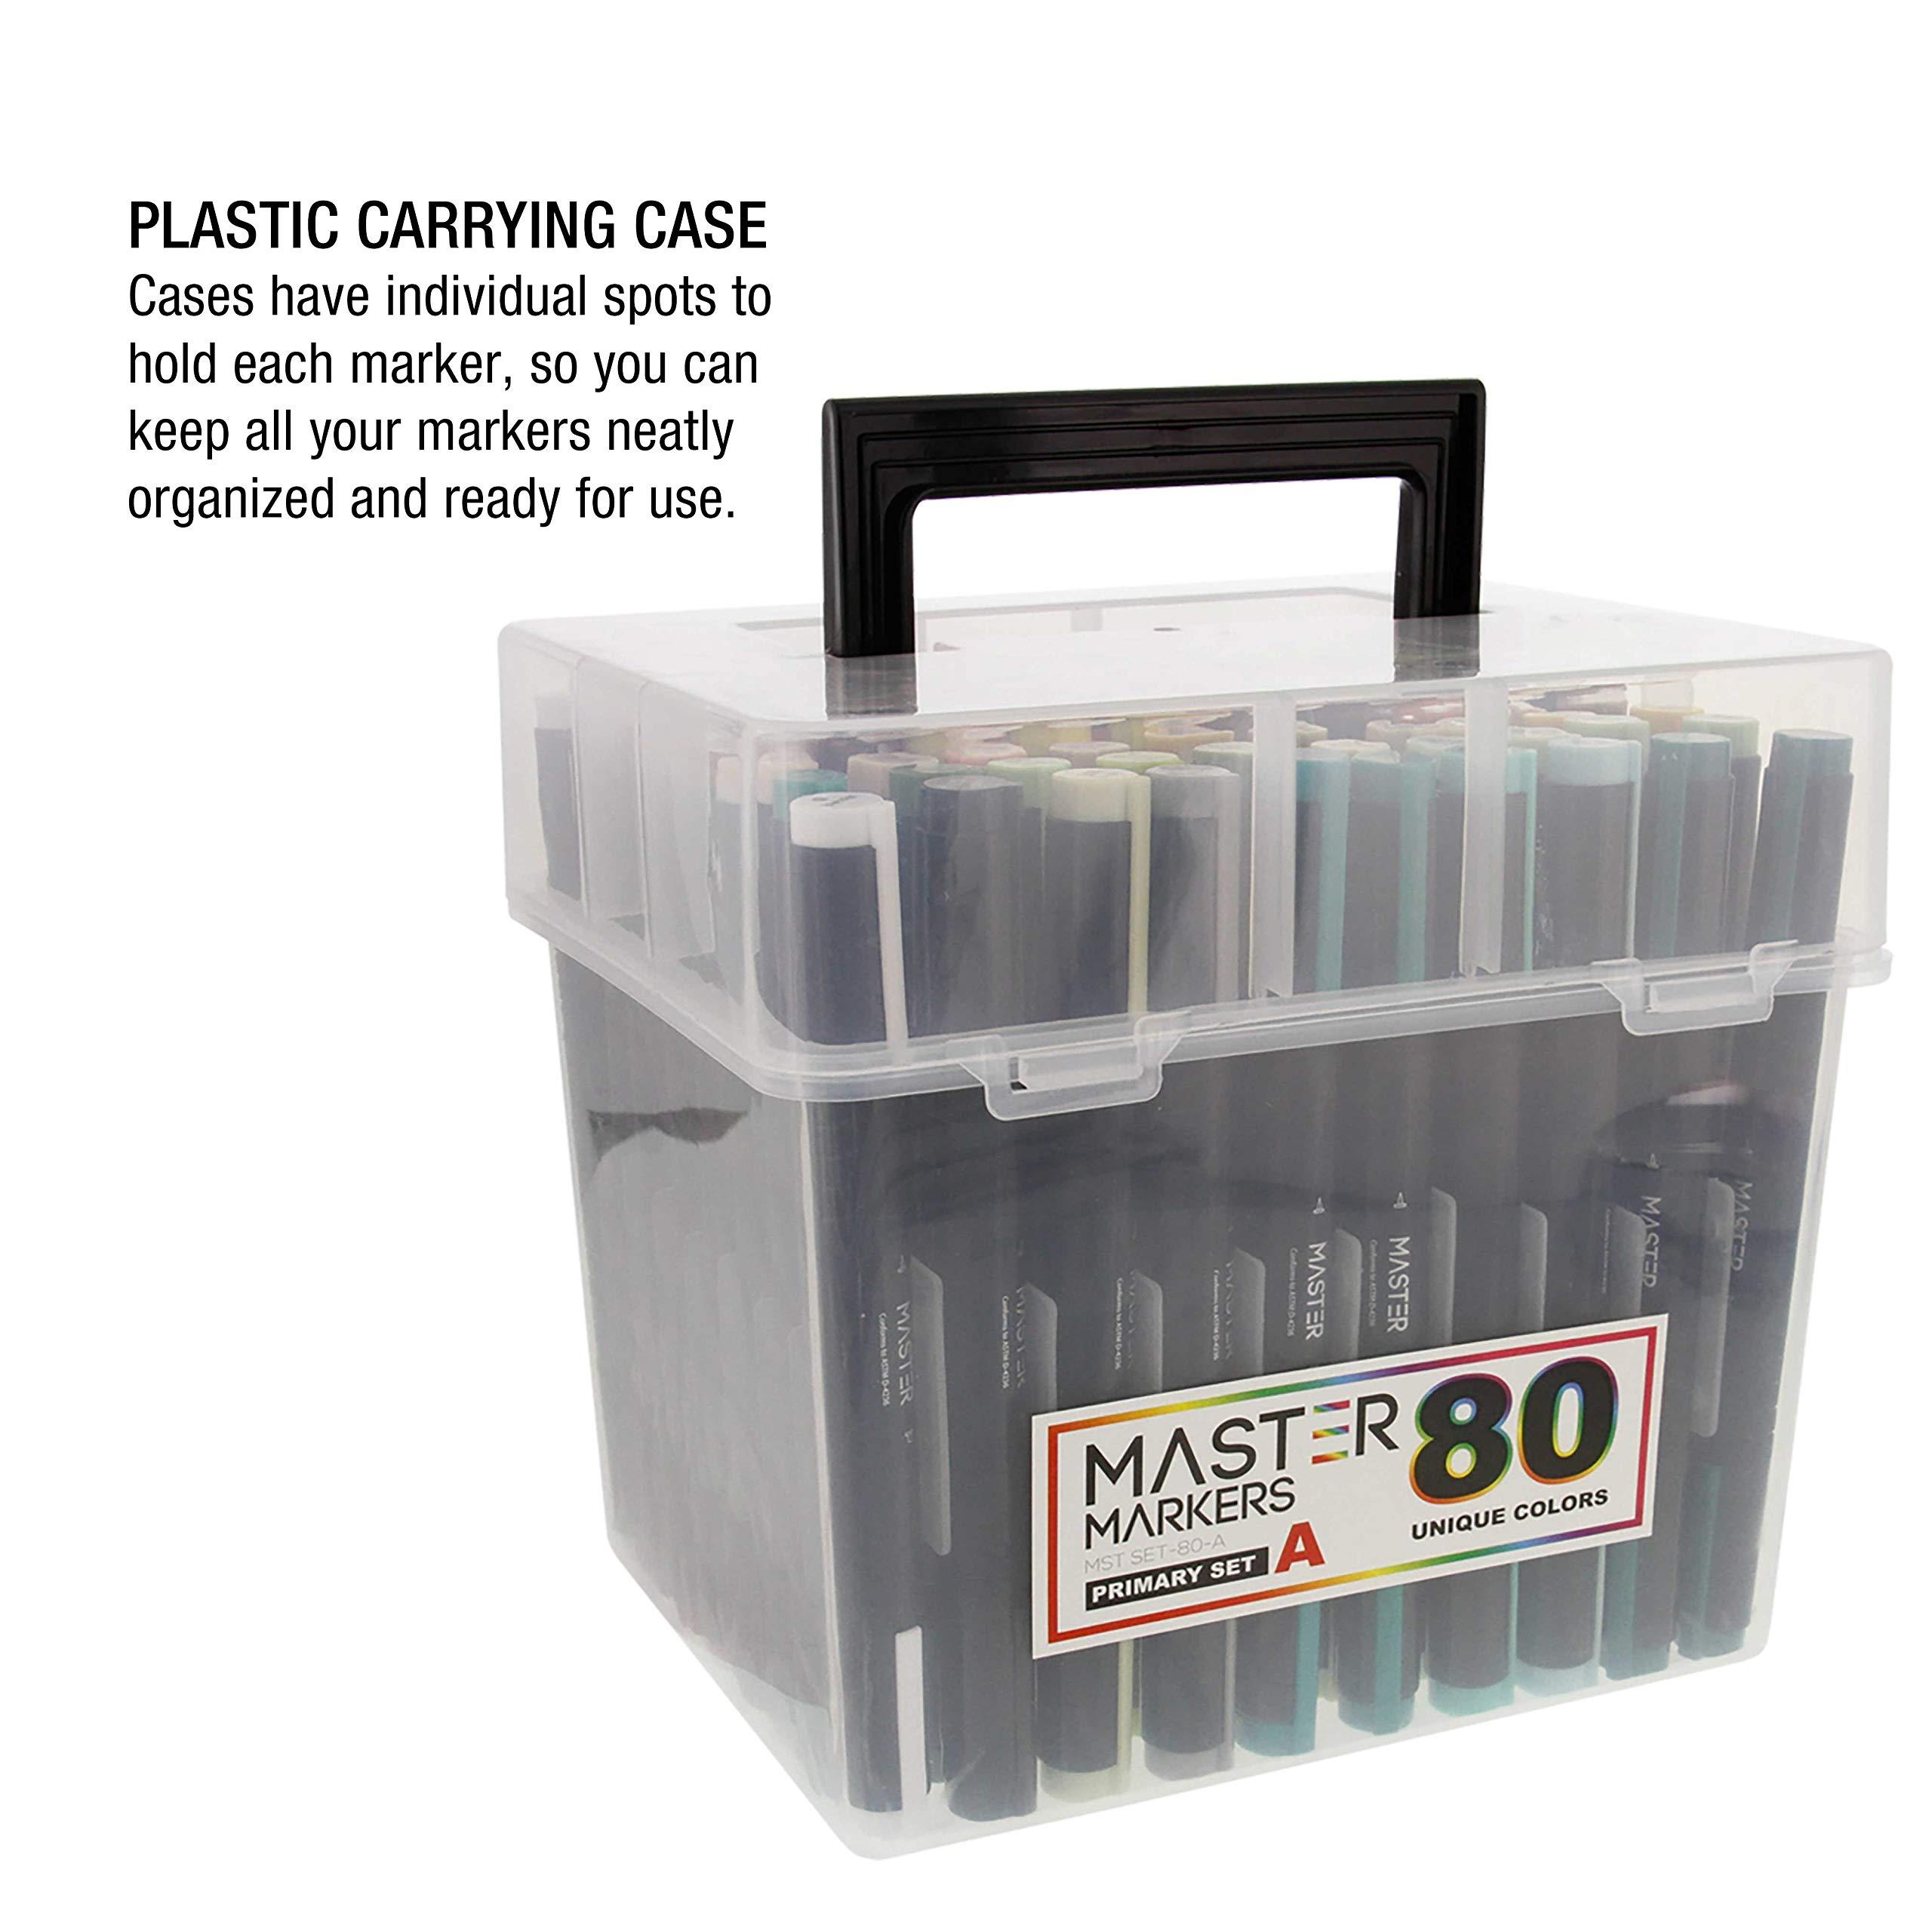 Master Marker 80 Slot  Heavy-Duty Nylon Marker Storage Case with Shoulder Strap